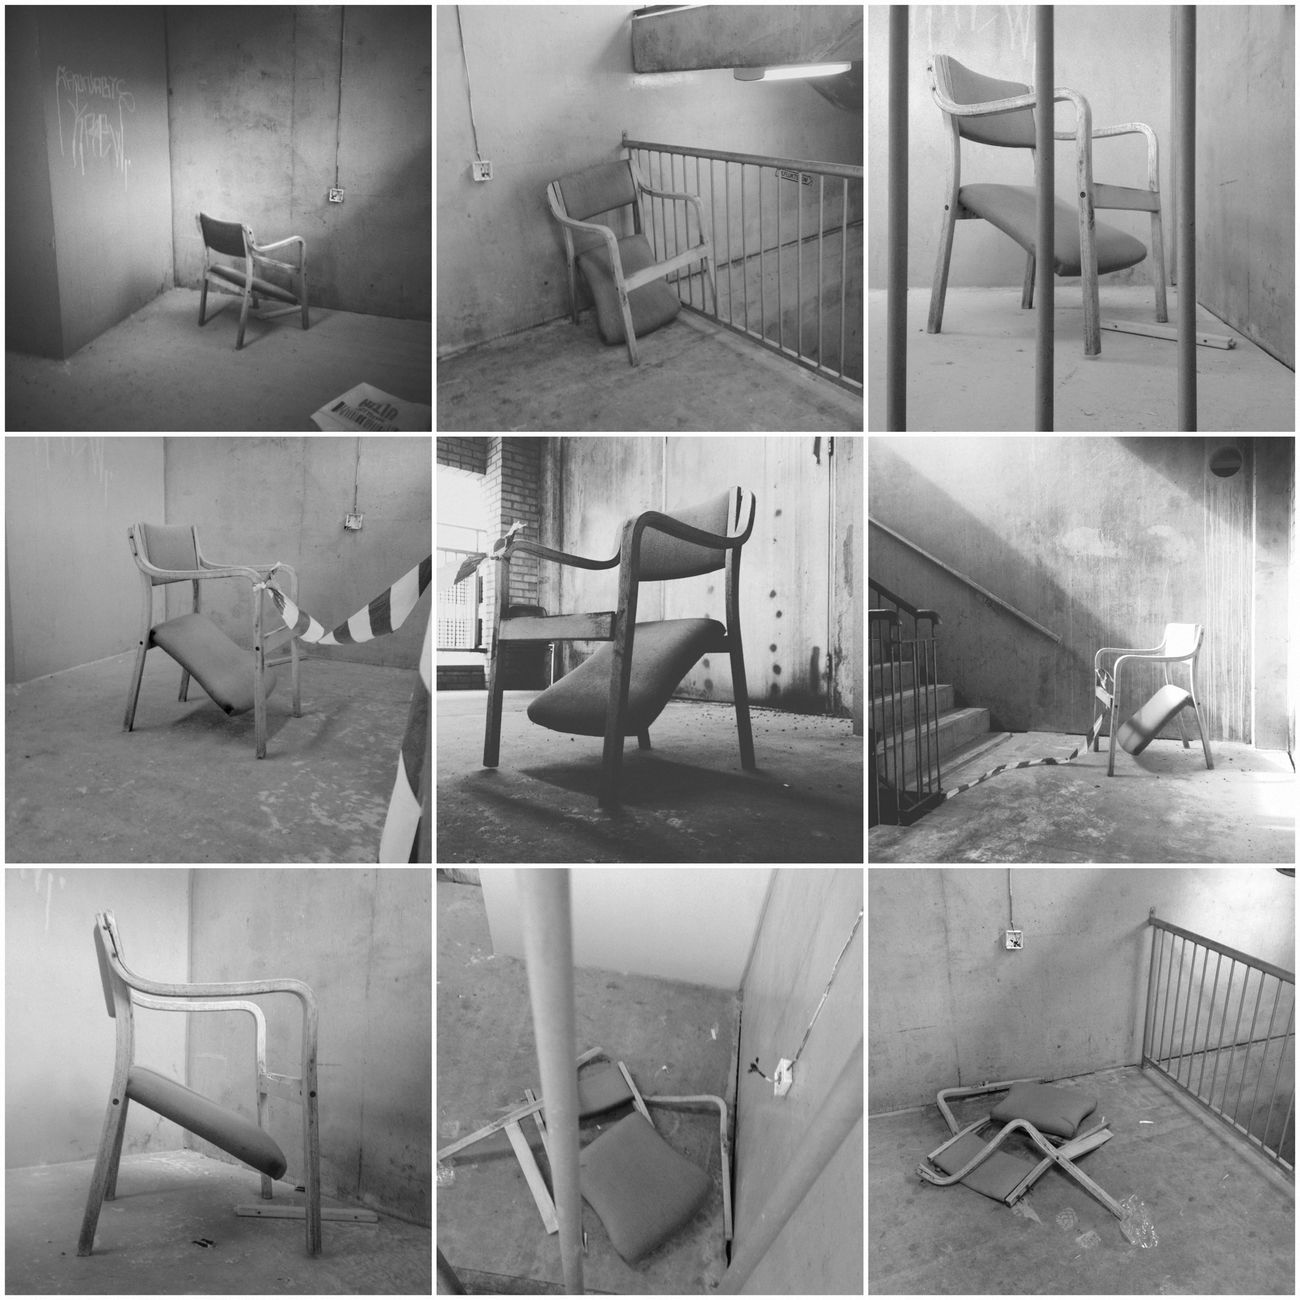 Life & Death of a Chair NEM Derelict Mob Fiction we are We Are Juxt